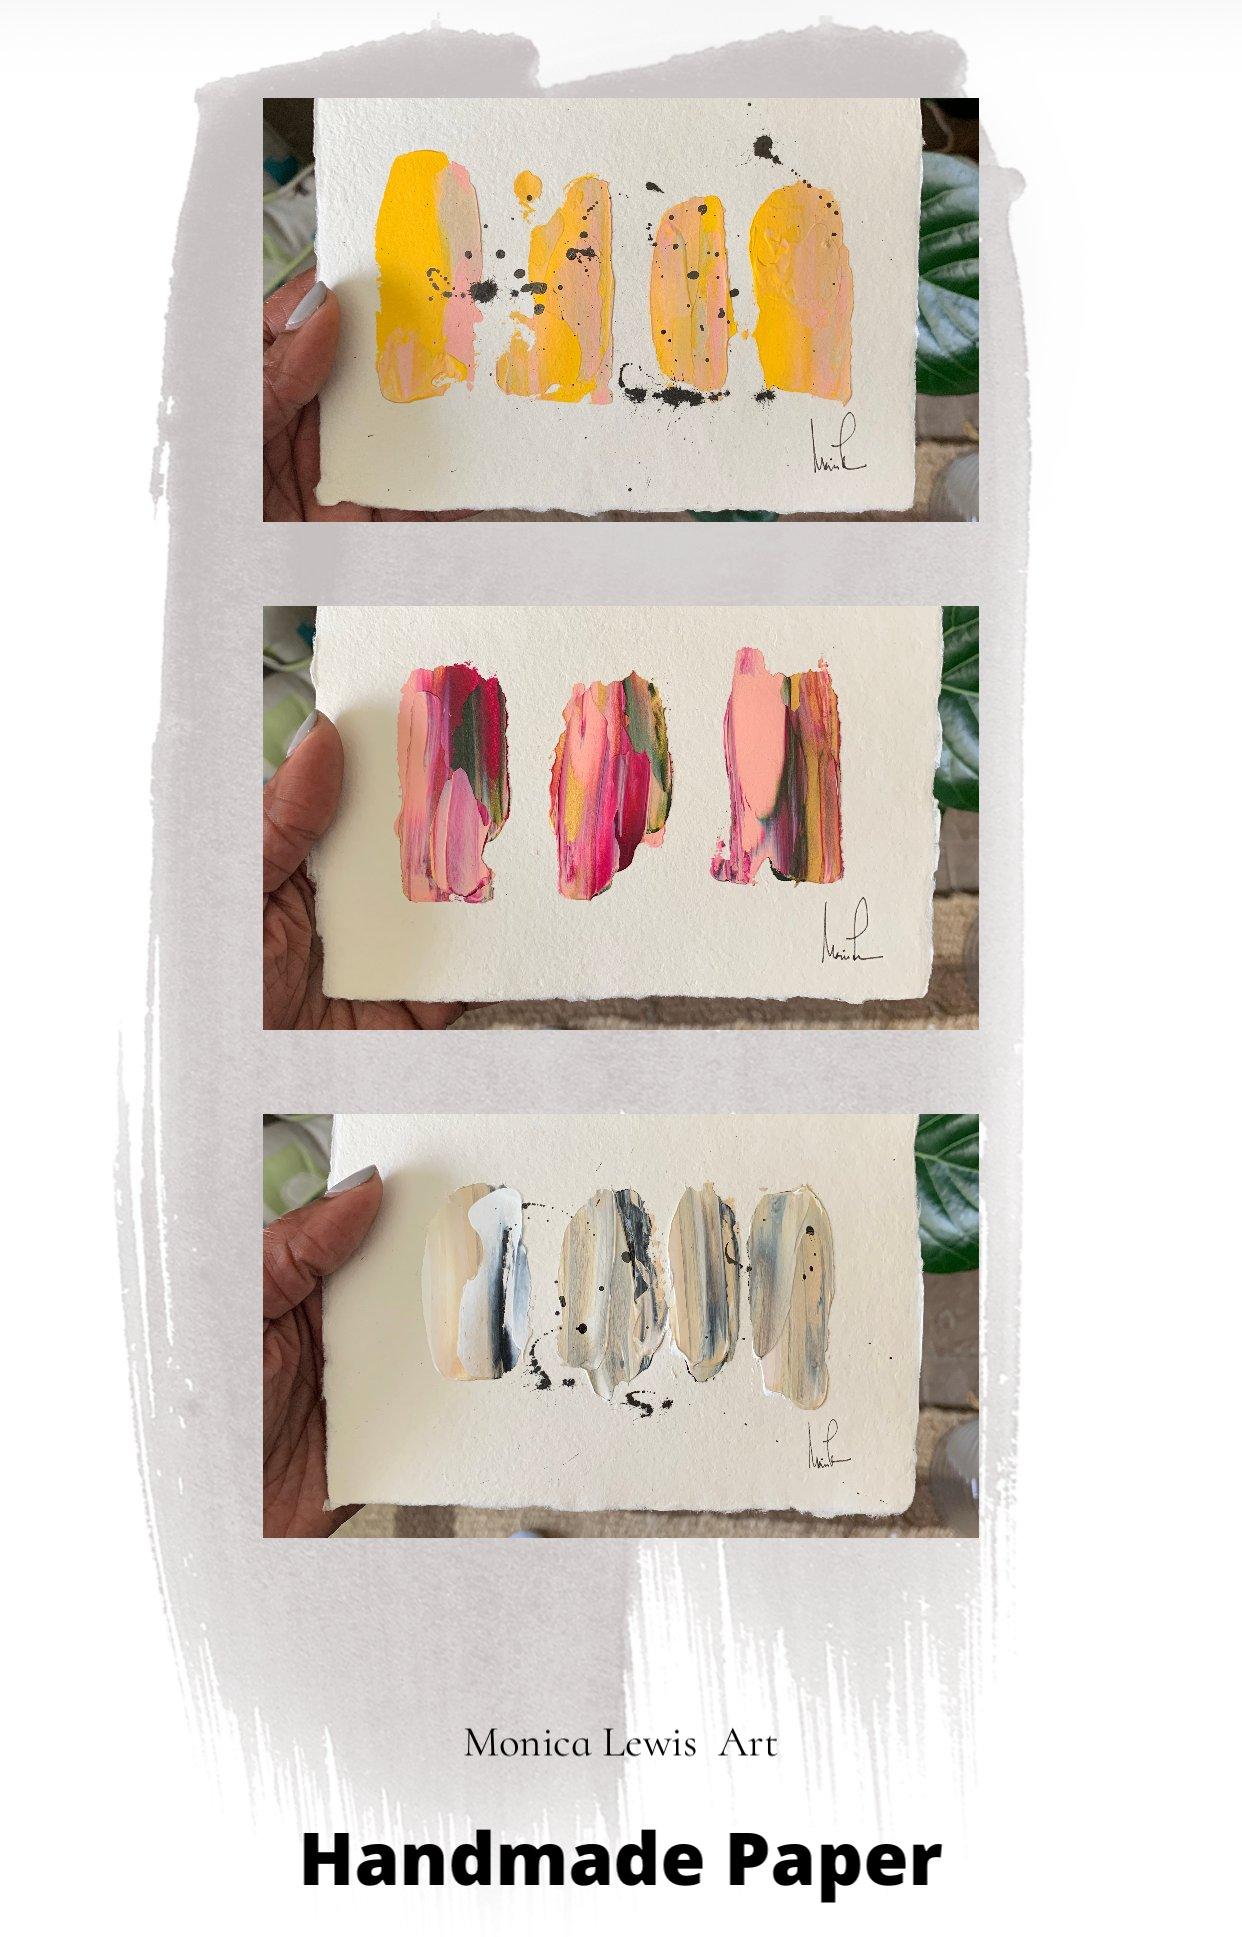 Image of 5x7 Handmade Paper Art (2a)